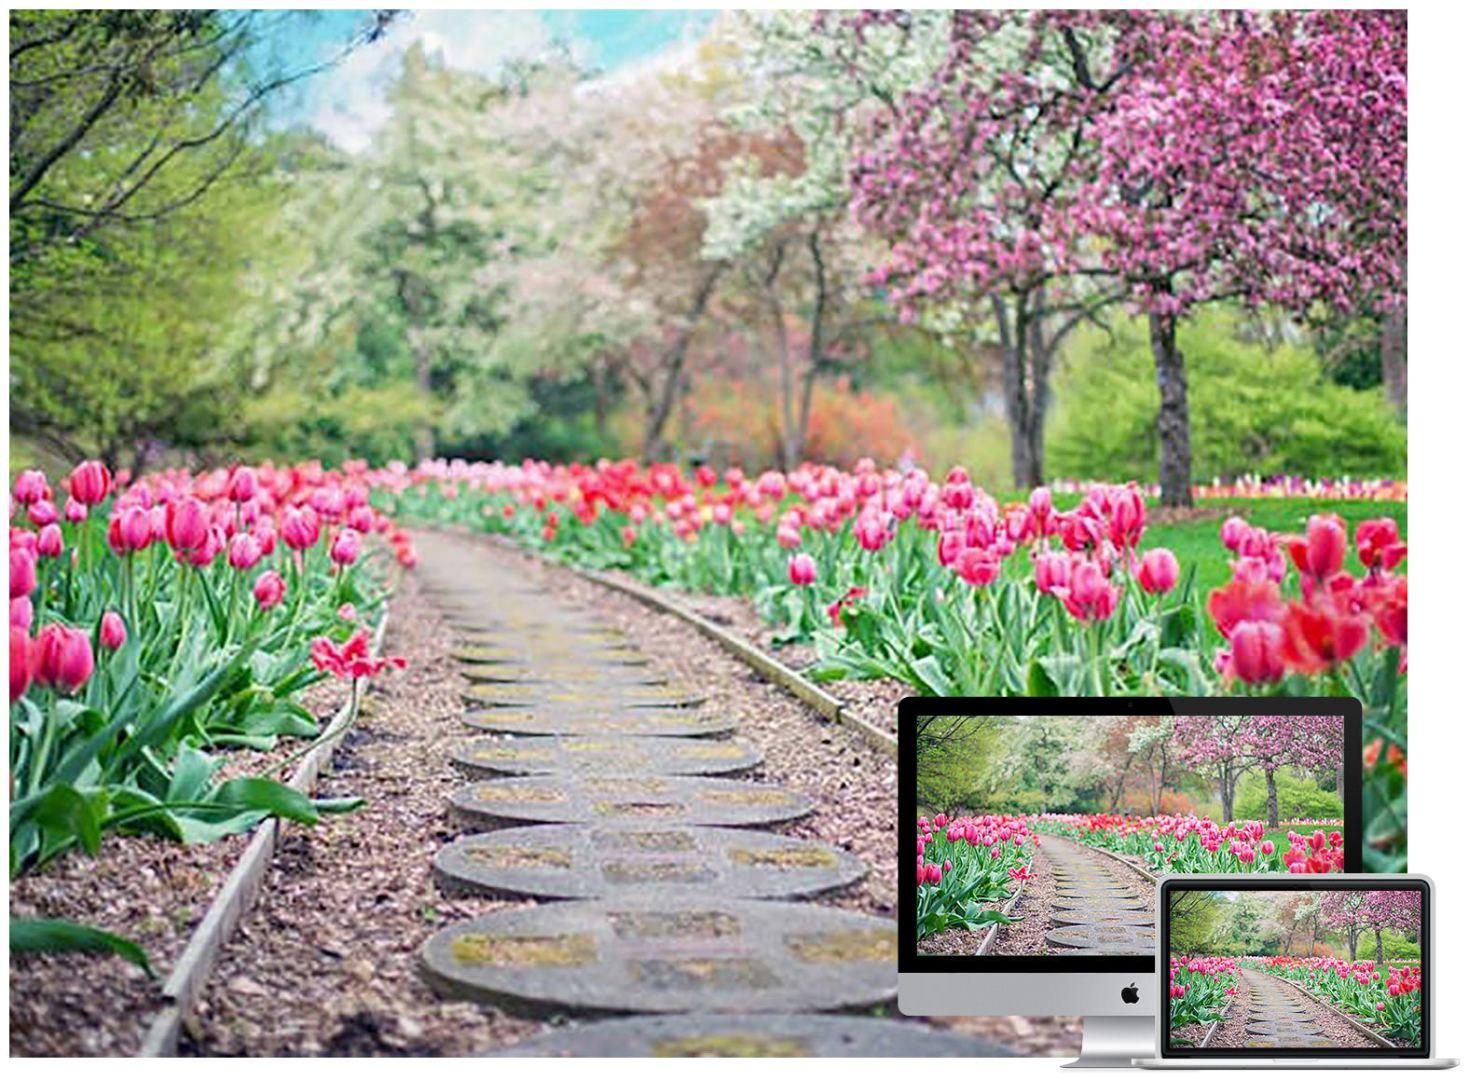 tulips-park-wallpaper